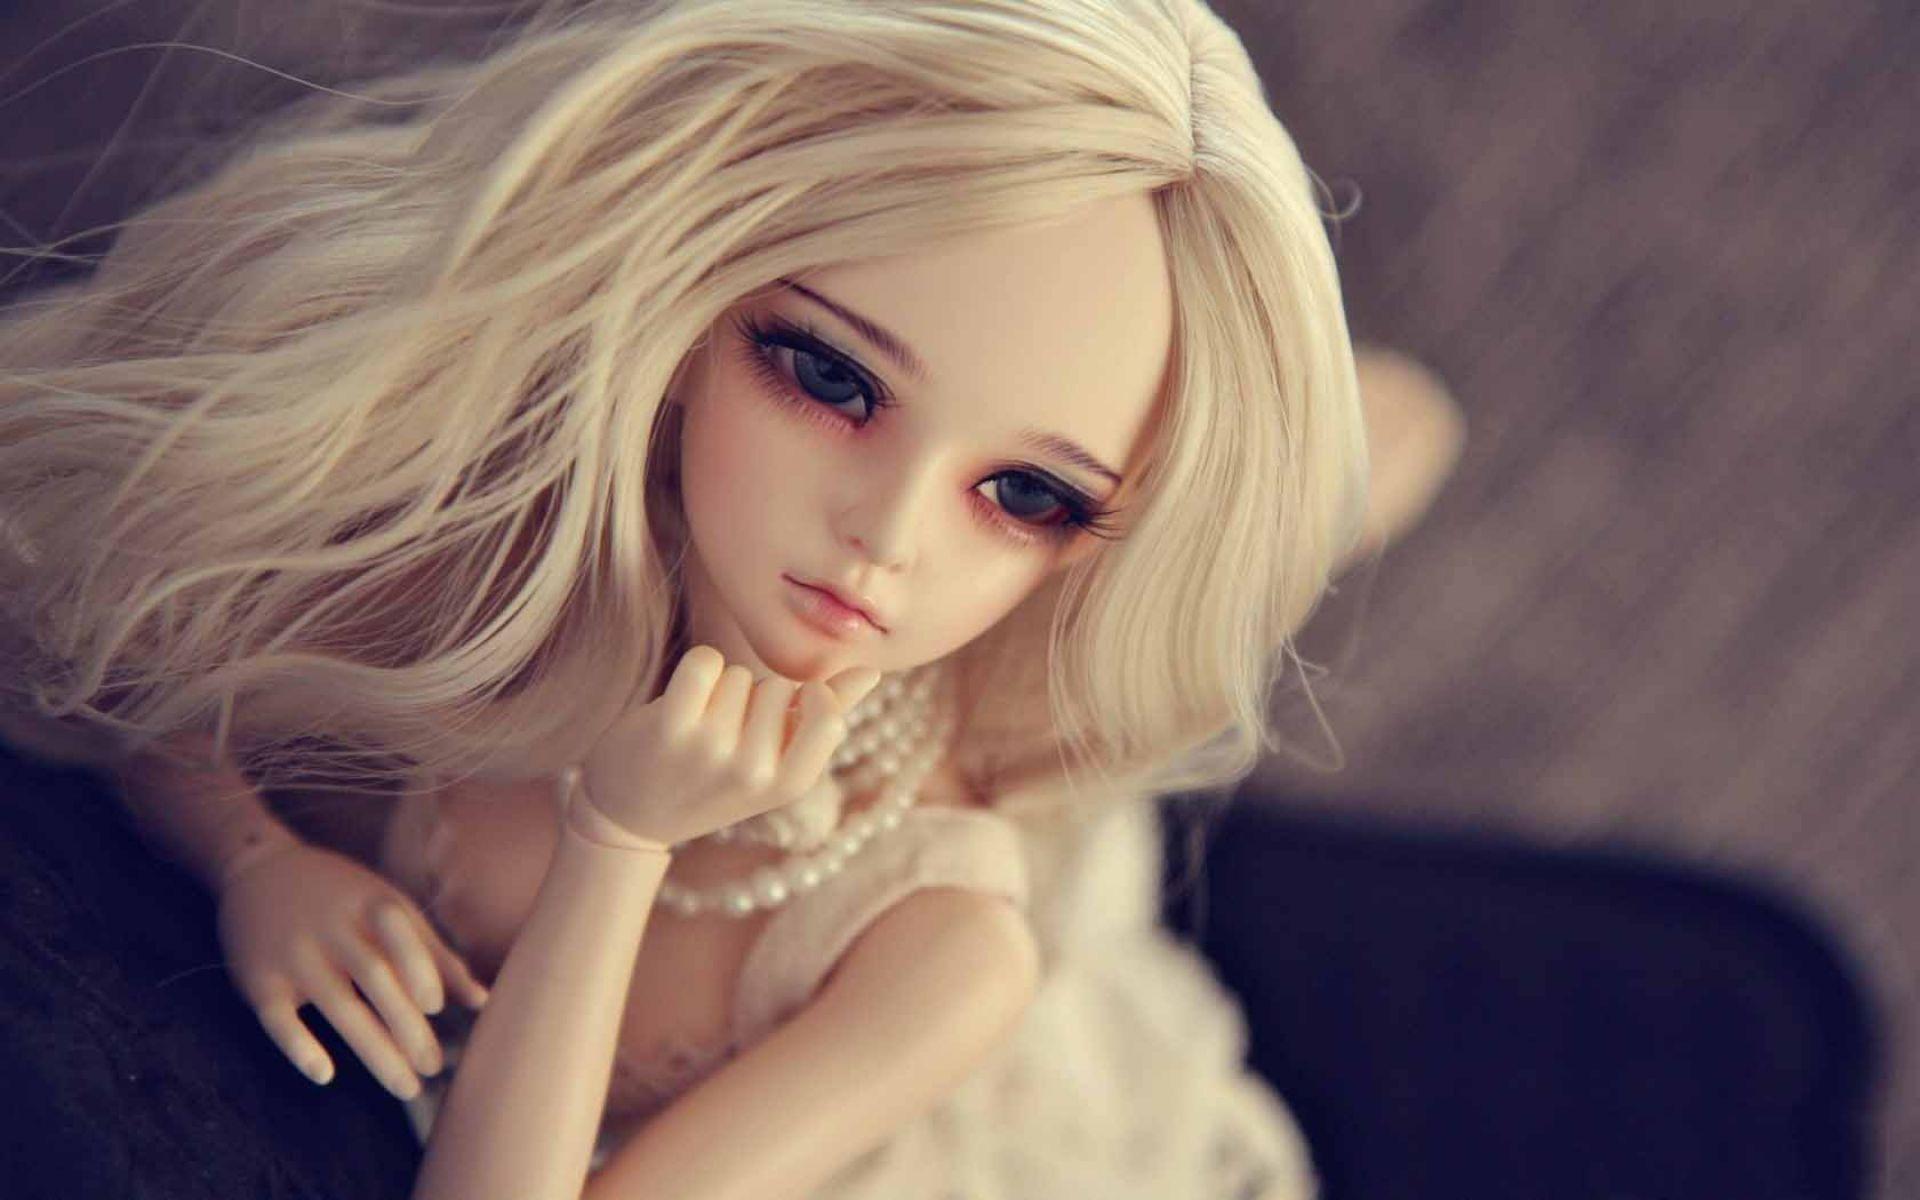 Doll blonde look anime girl wallpaper 1920x1200 1220003 wallpaperup